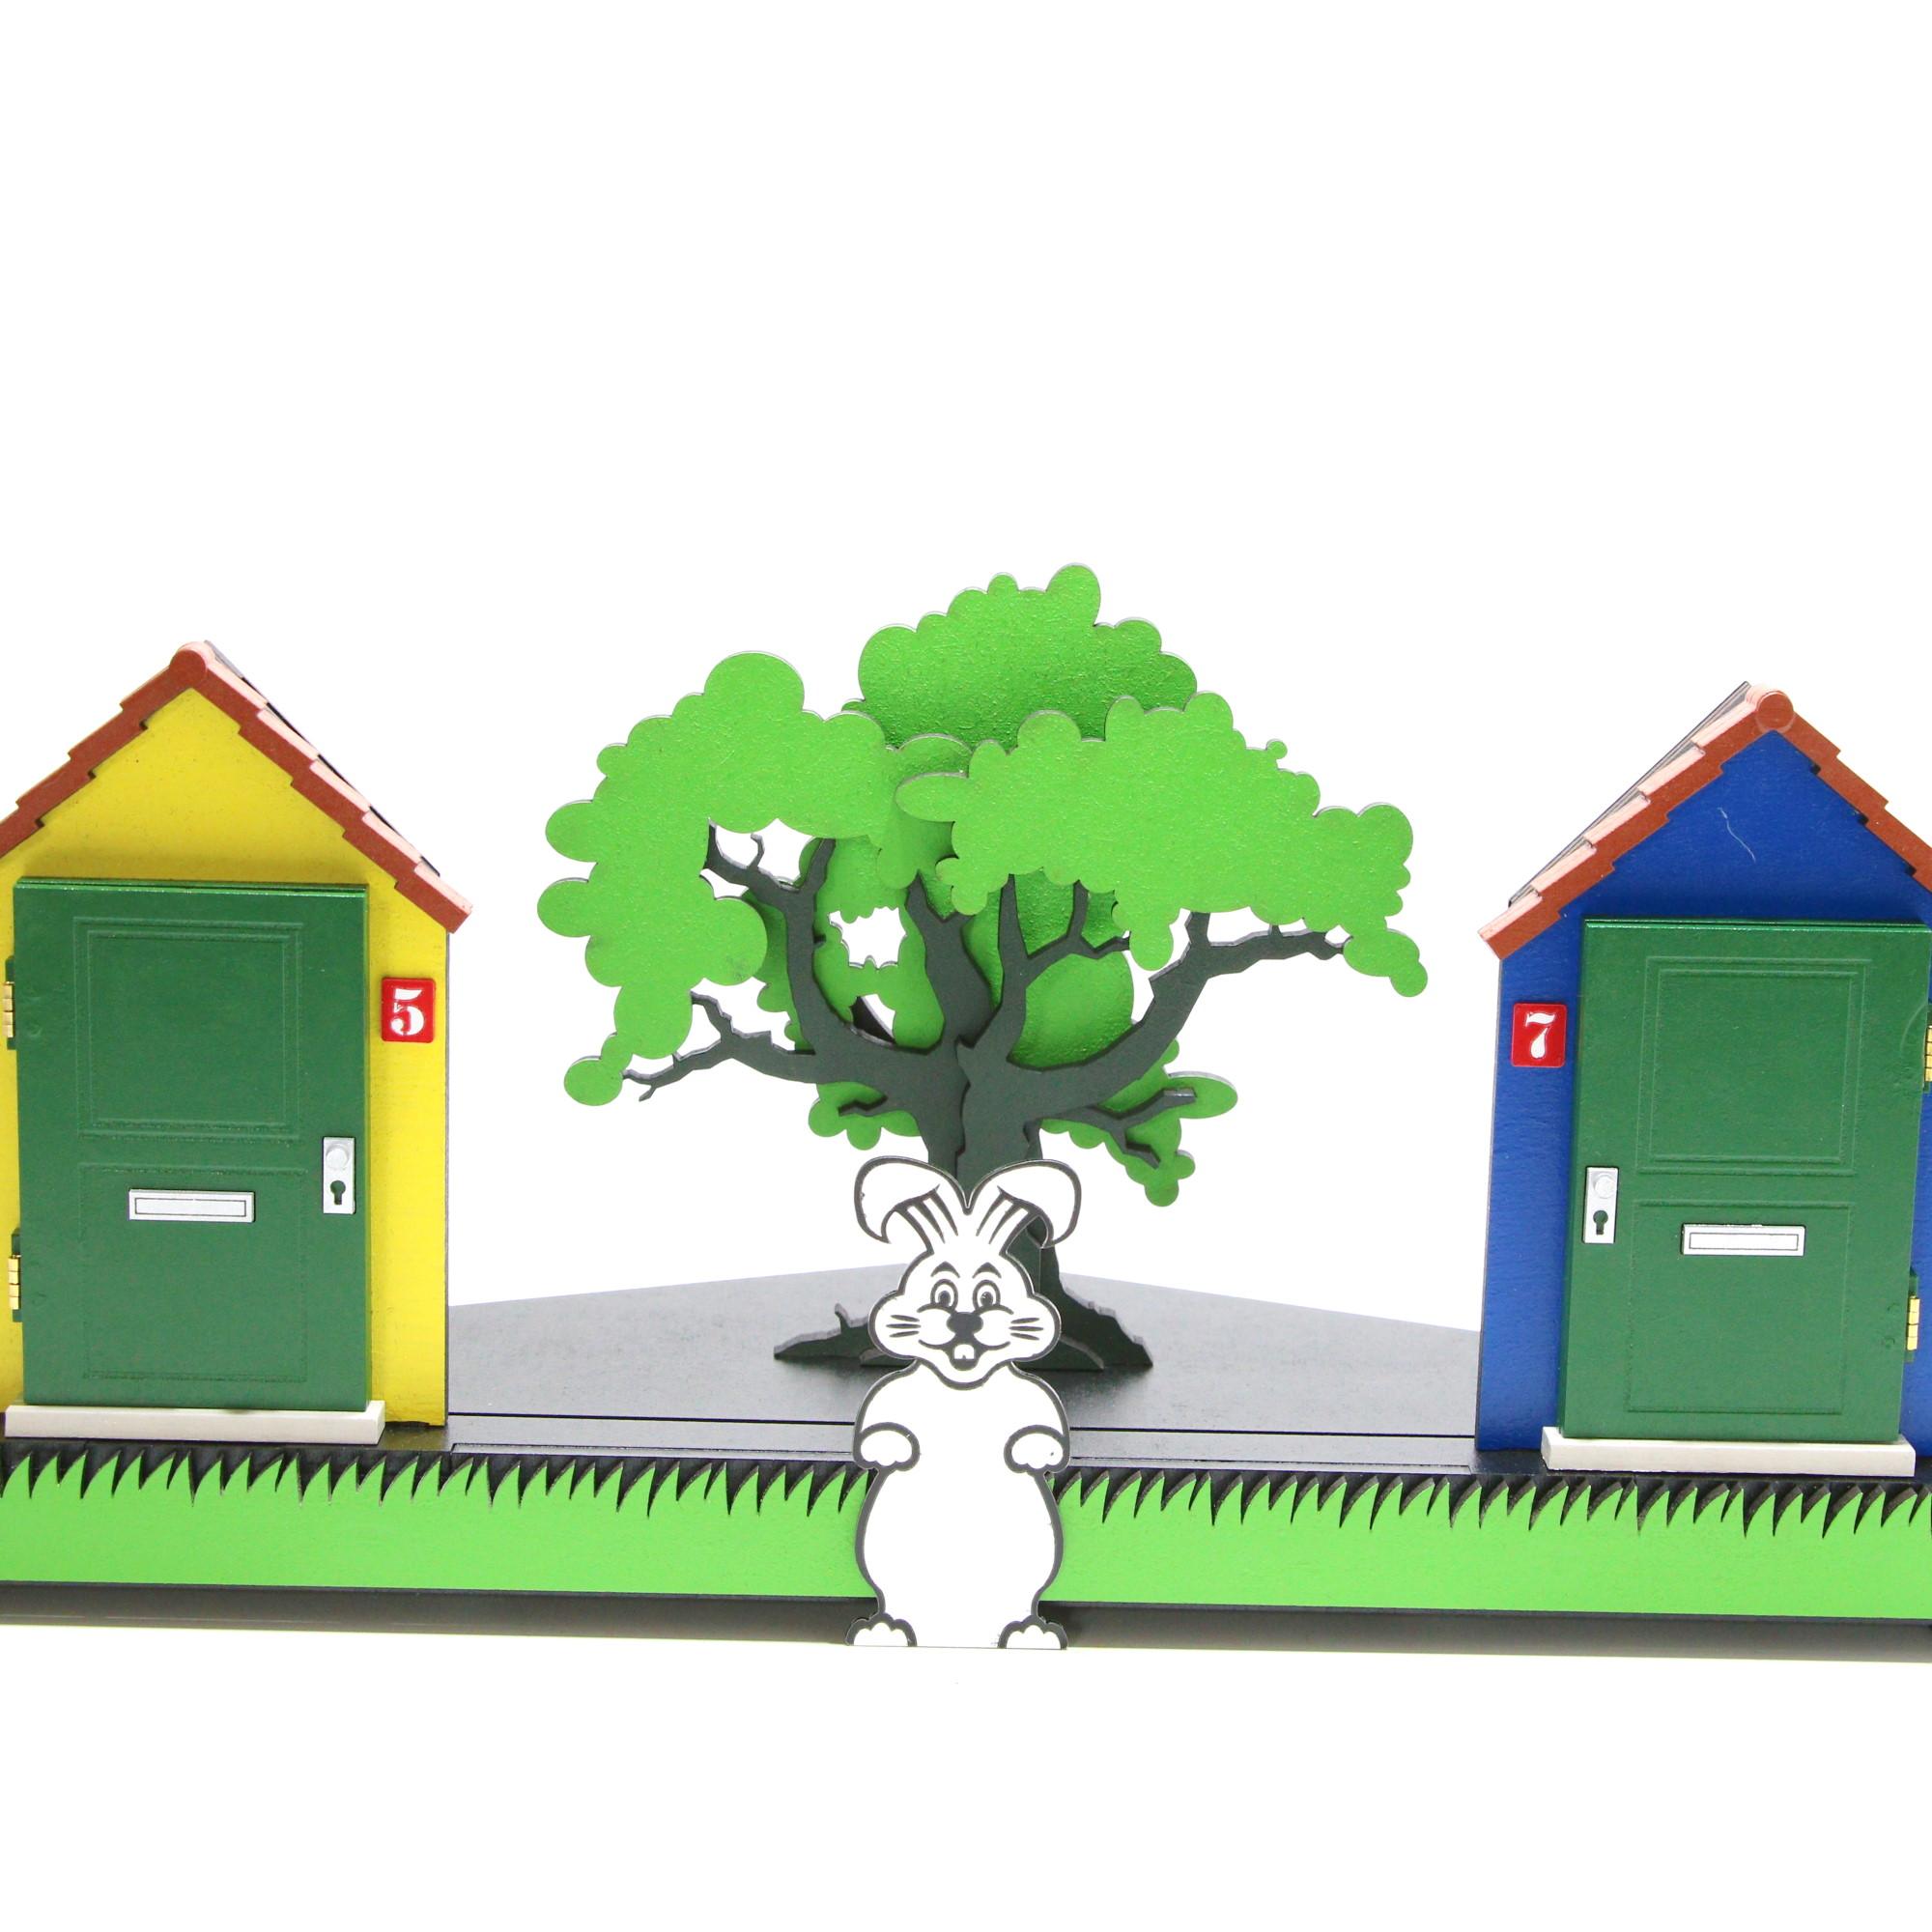 Micro Run Rabbit Run (Limited Edition) by Holland Magic Studio